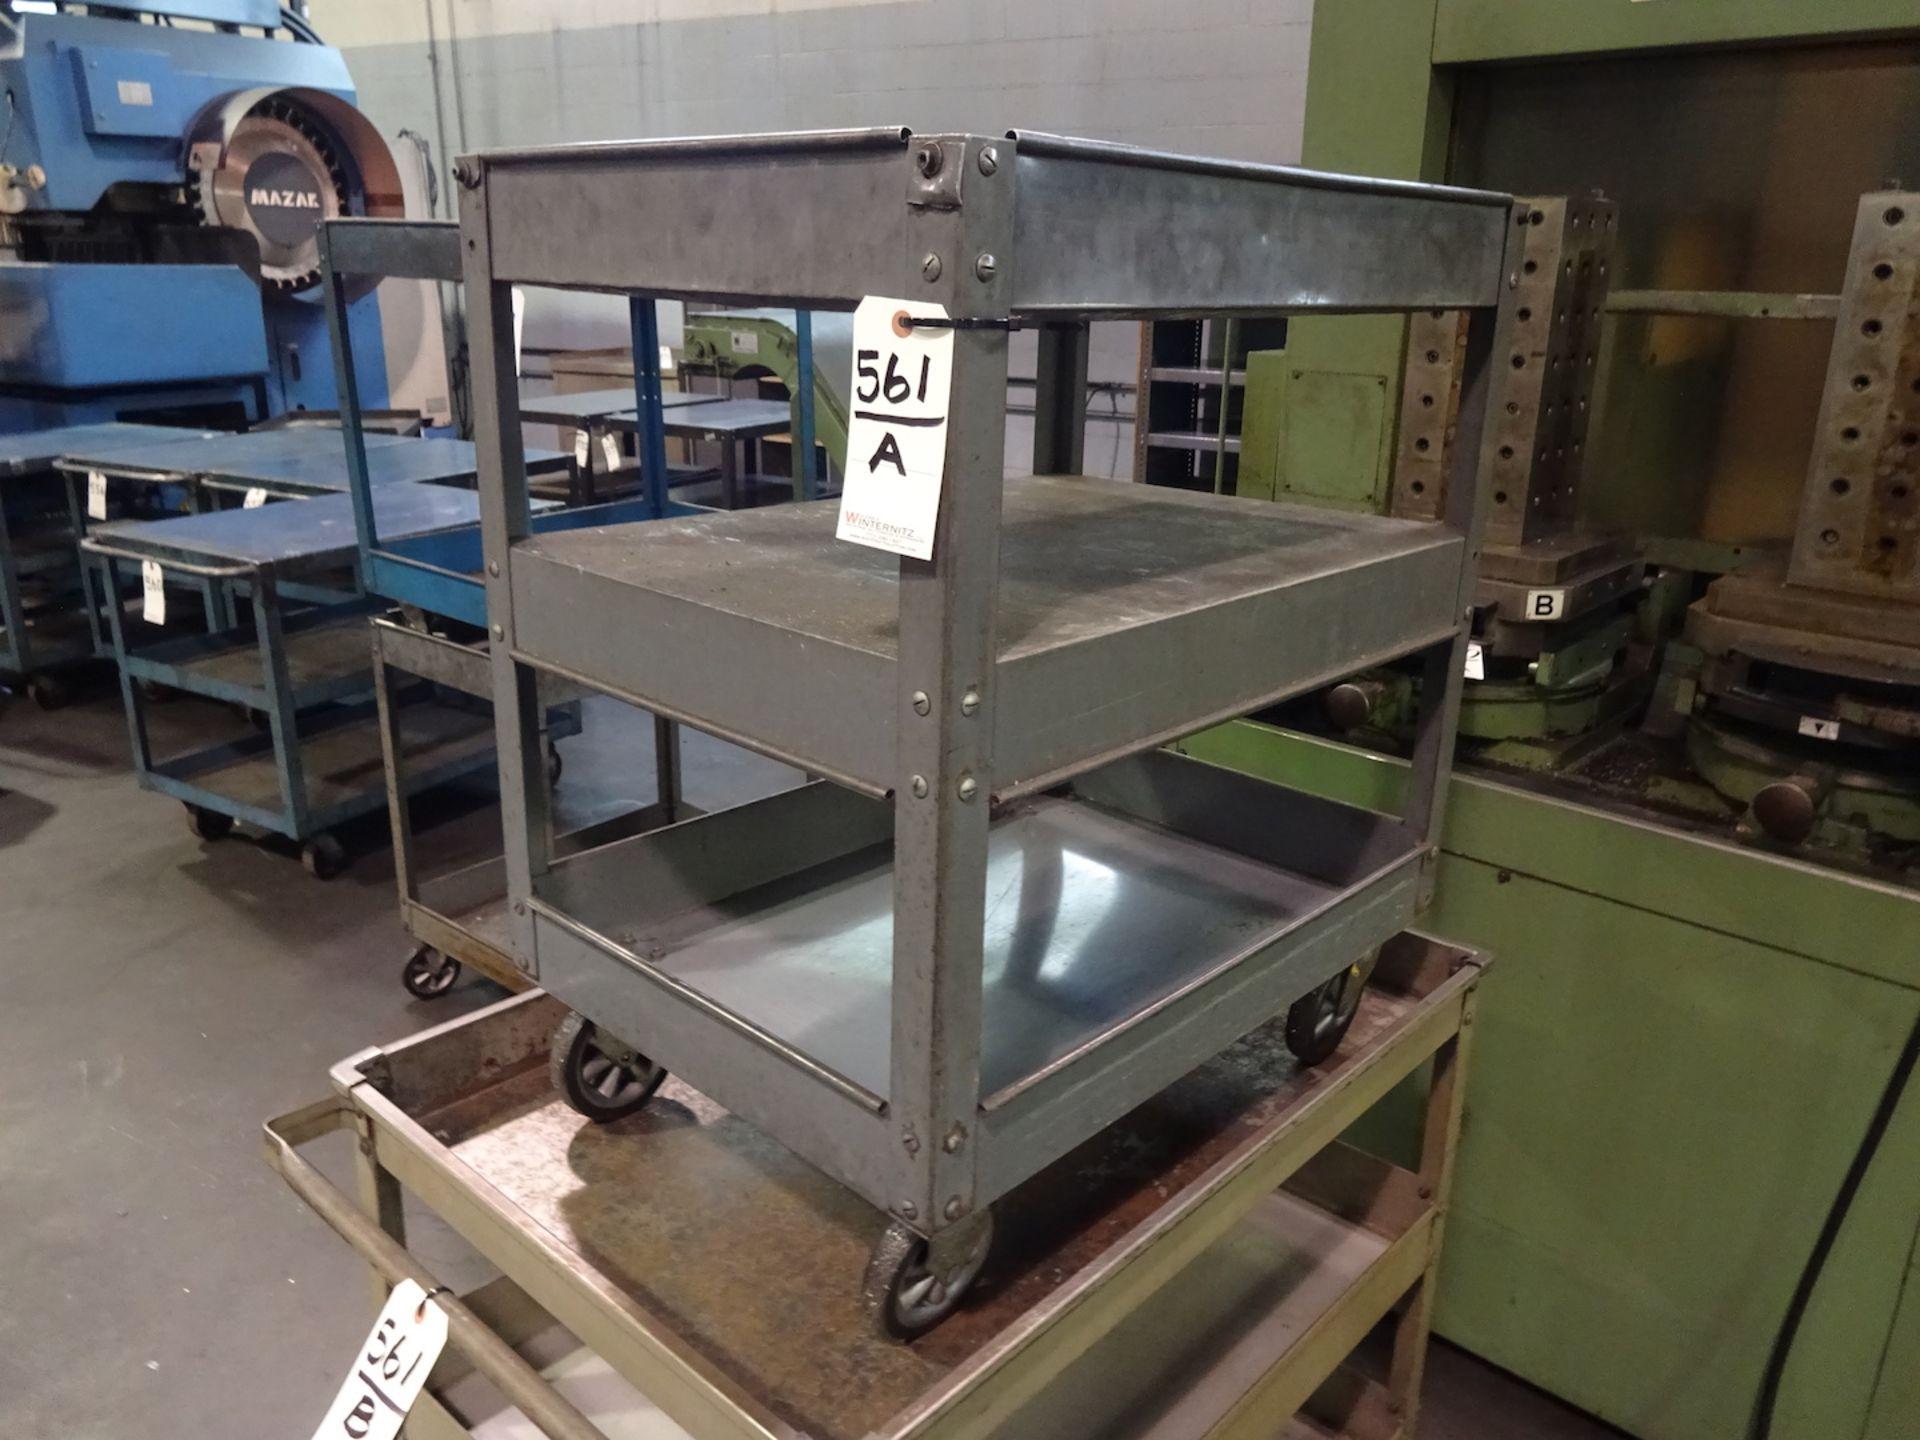 Lot 561A - Steel Shop Cart